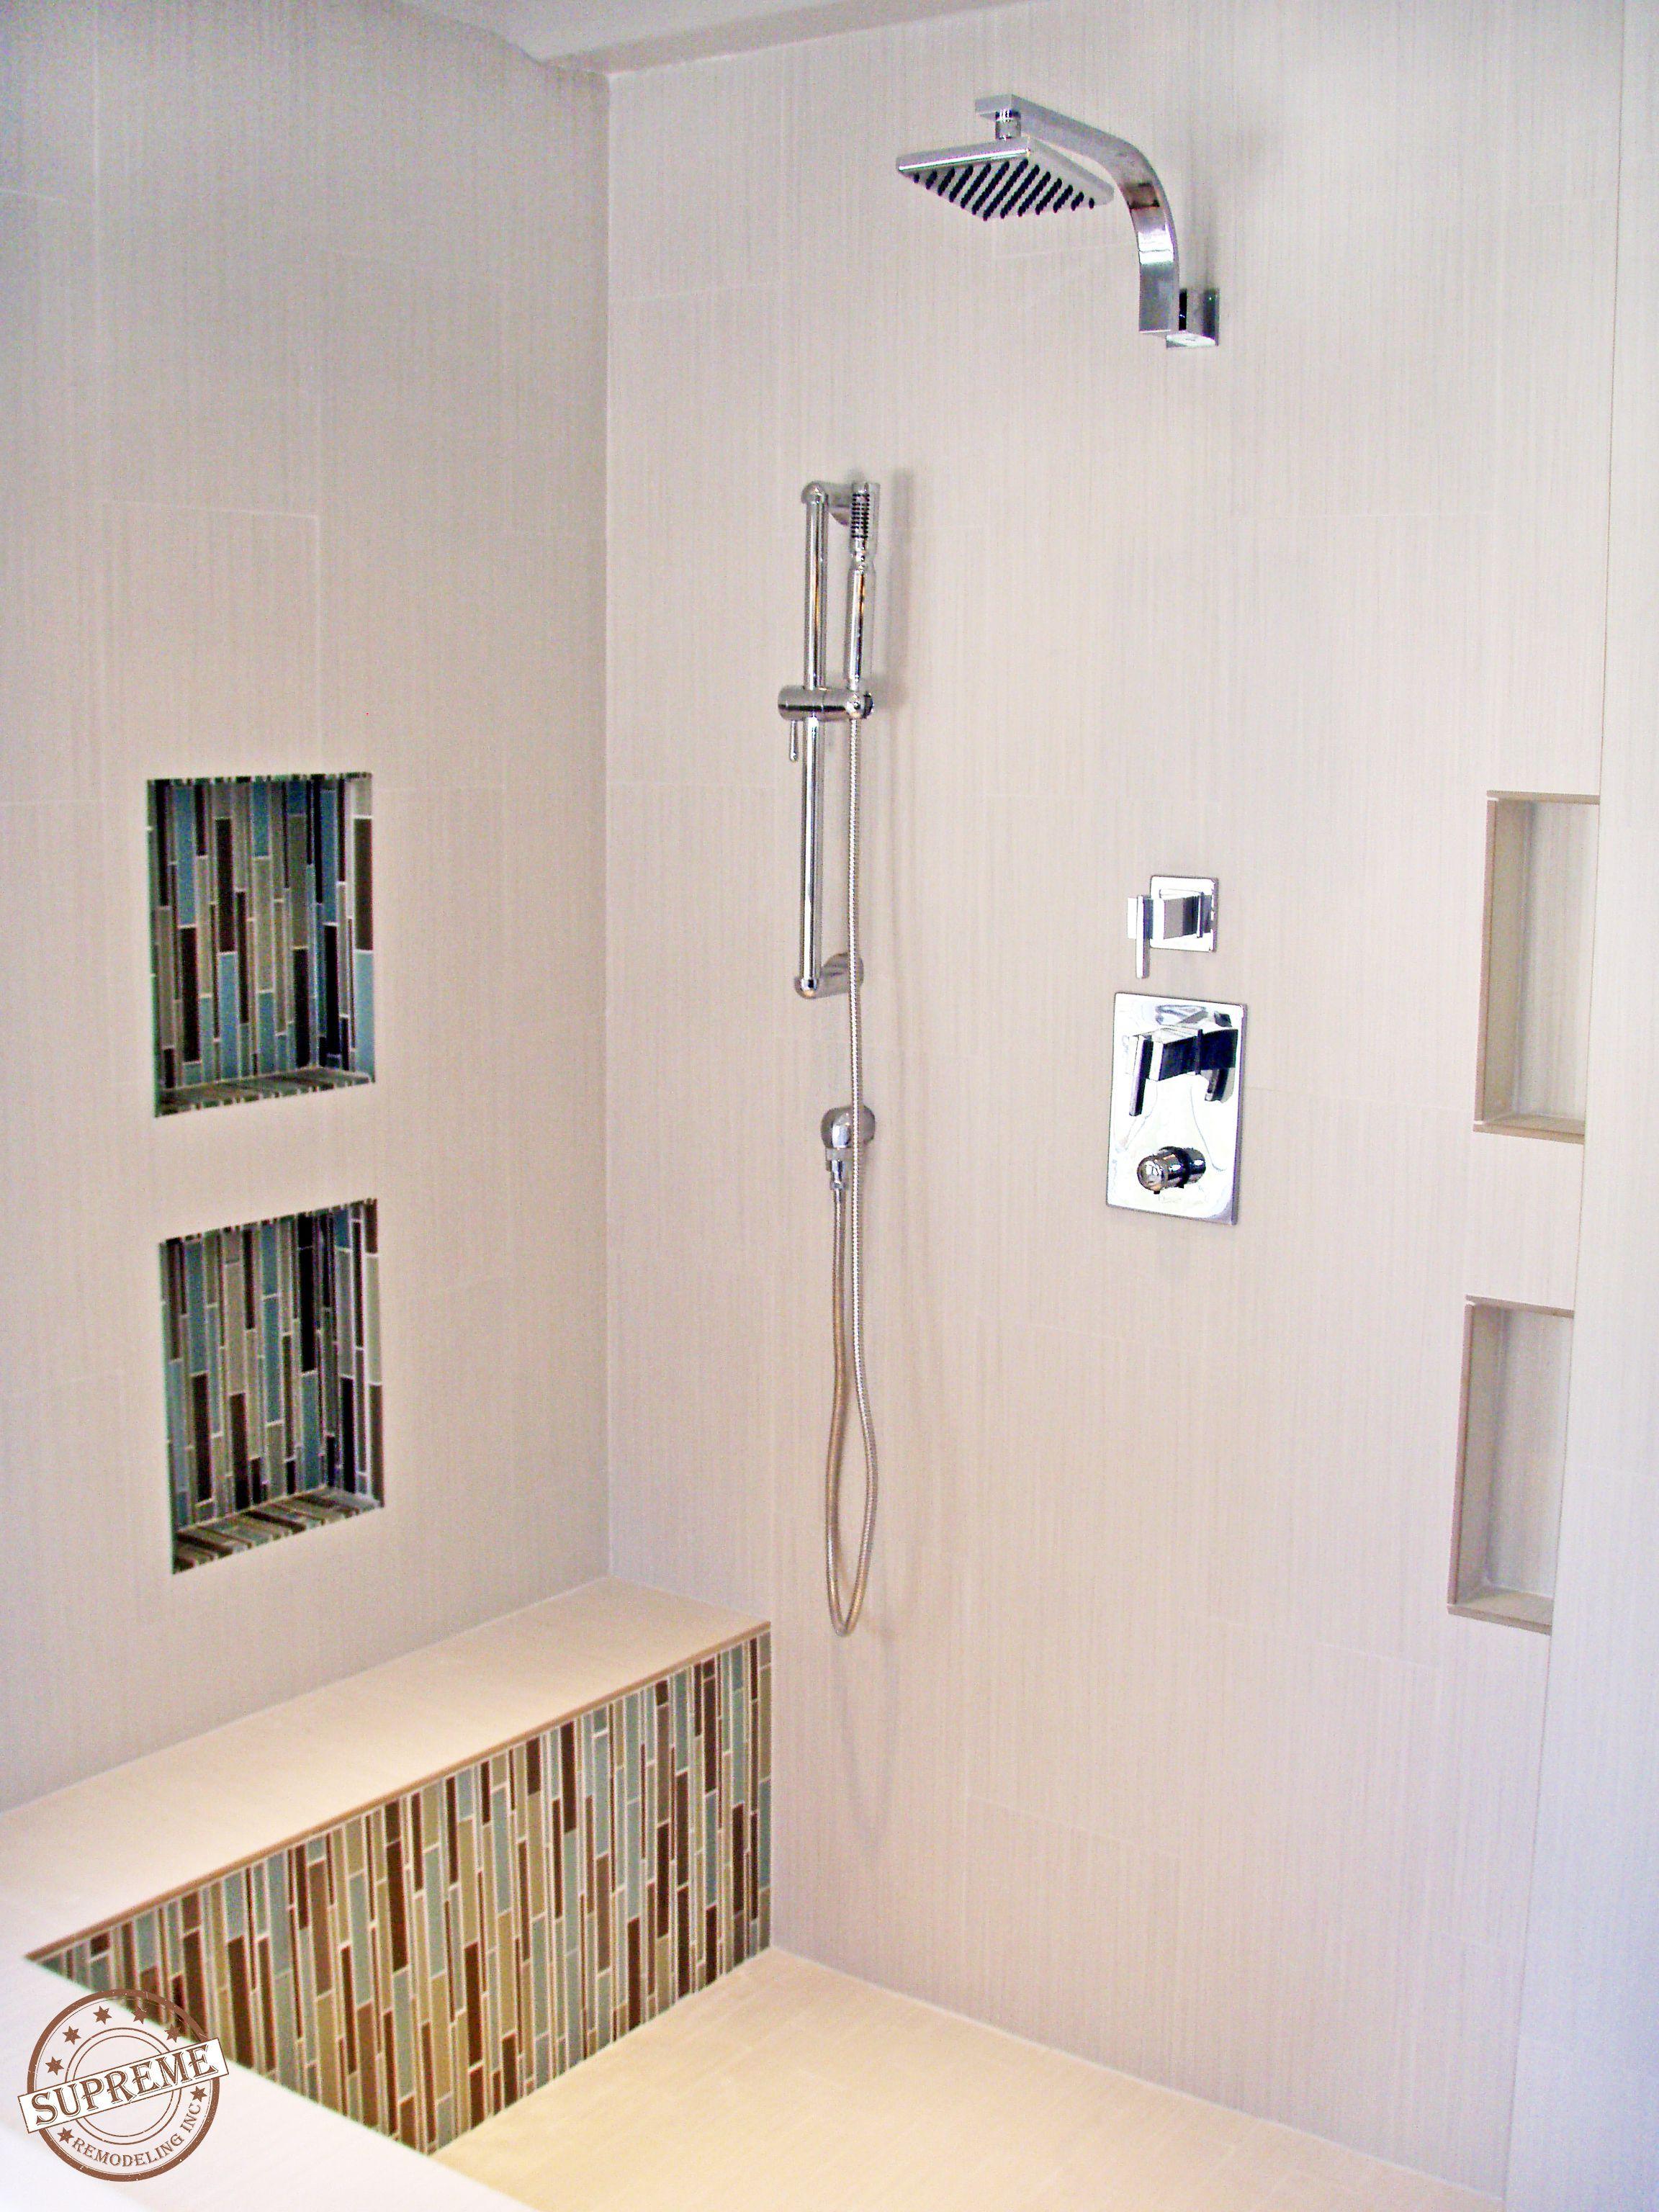 How To Retile A Shower With Images Diy Shower Shower Design Shower Shelves